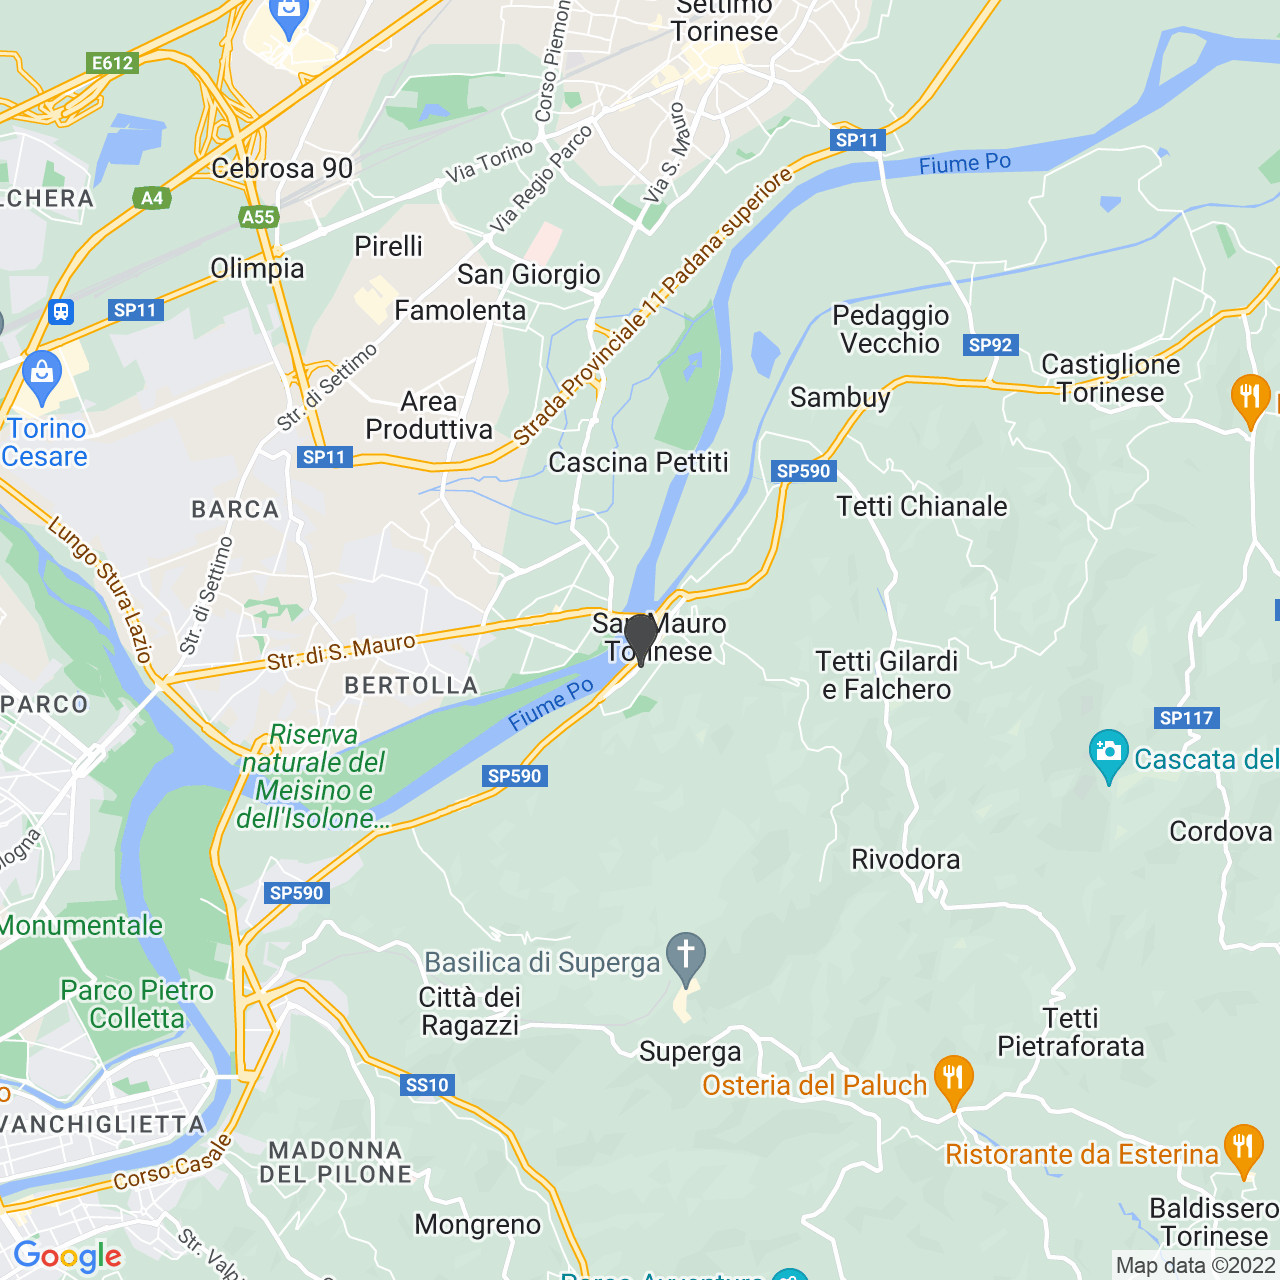 La Piemontese Pompe Funebri Dal 1949